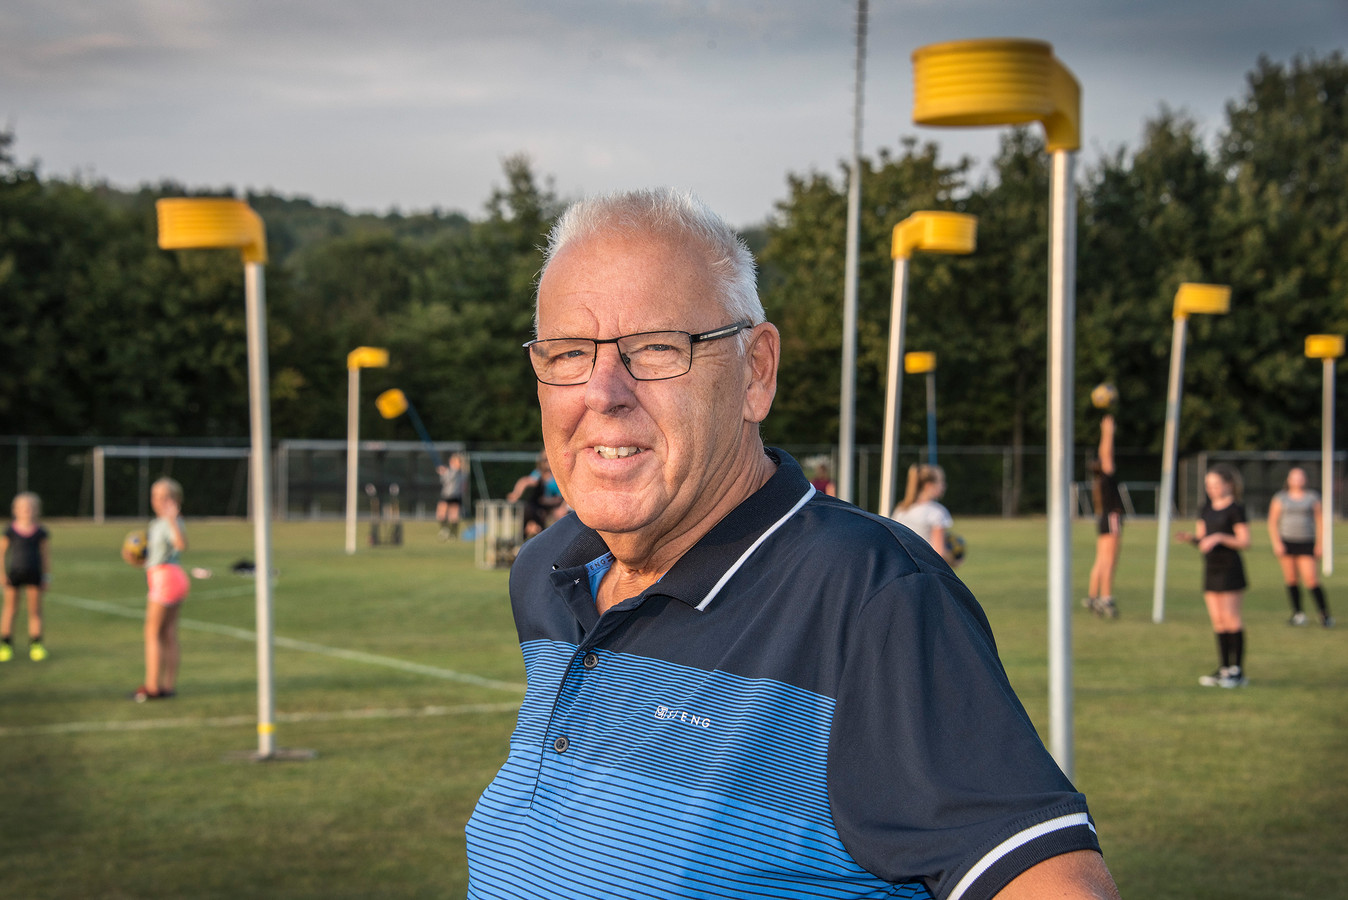 Johnny Vervoort, trainer van SPES.